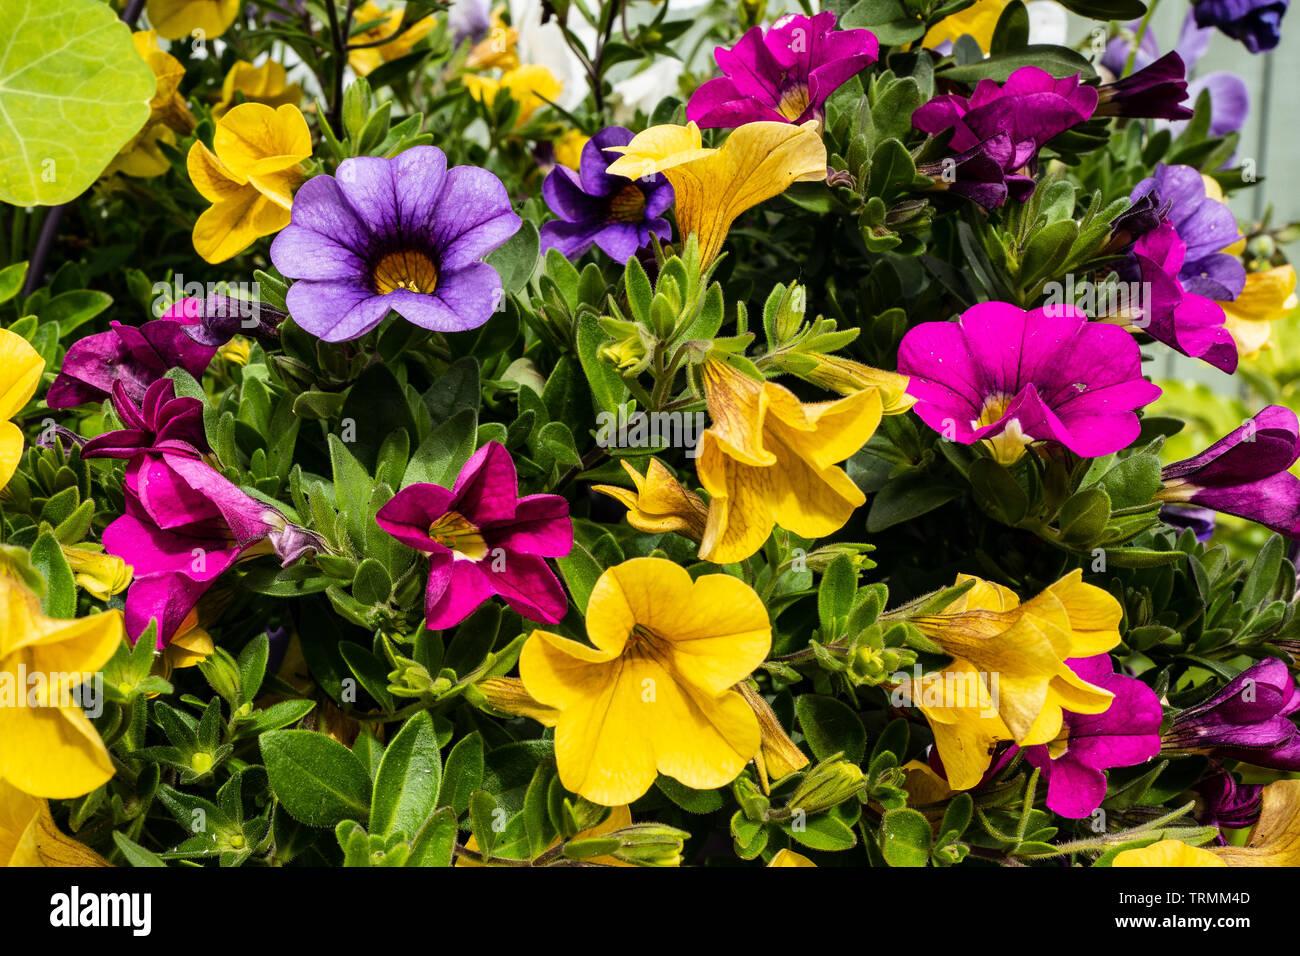 Stunning flower display Million Bells Colourful - Stock Image